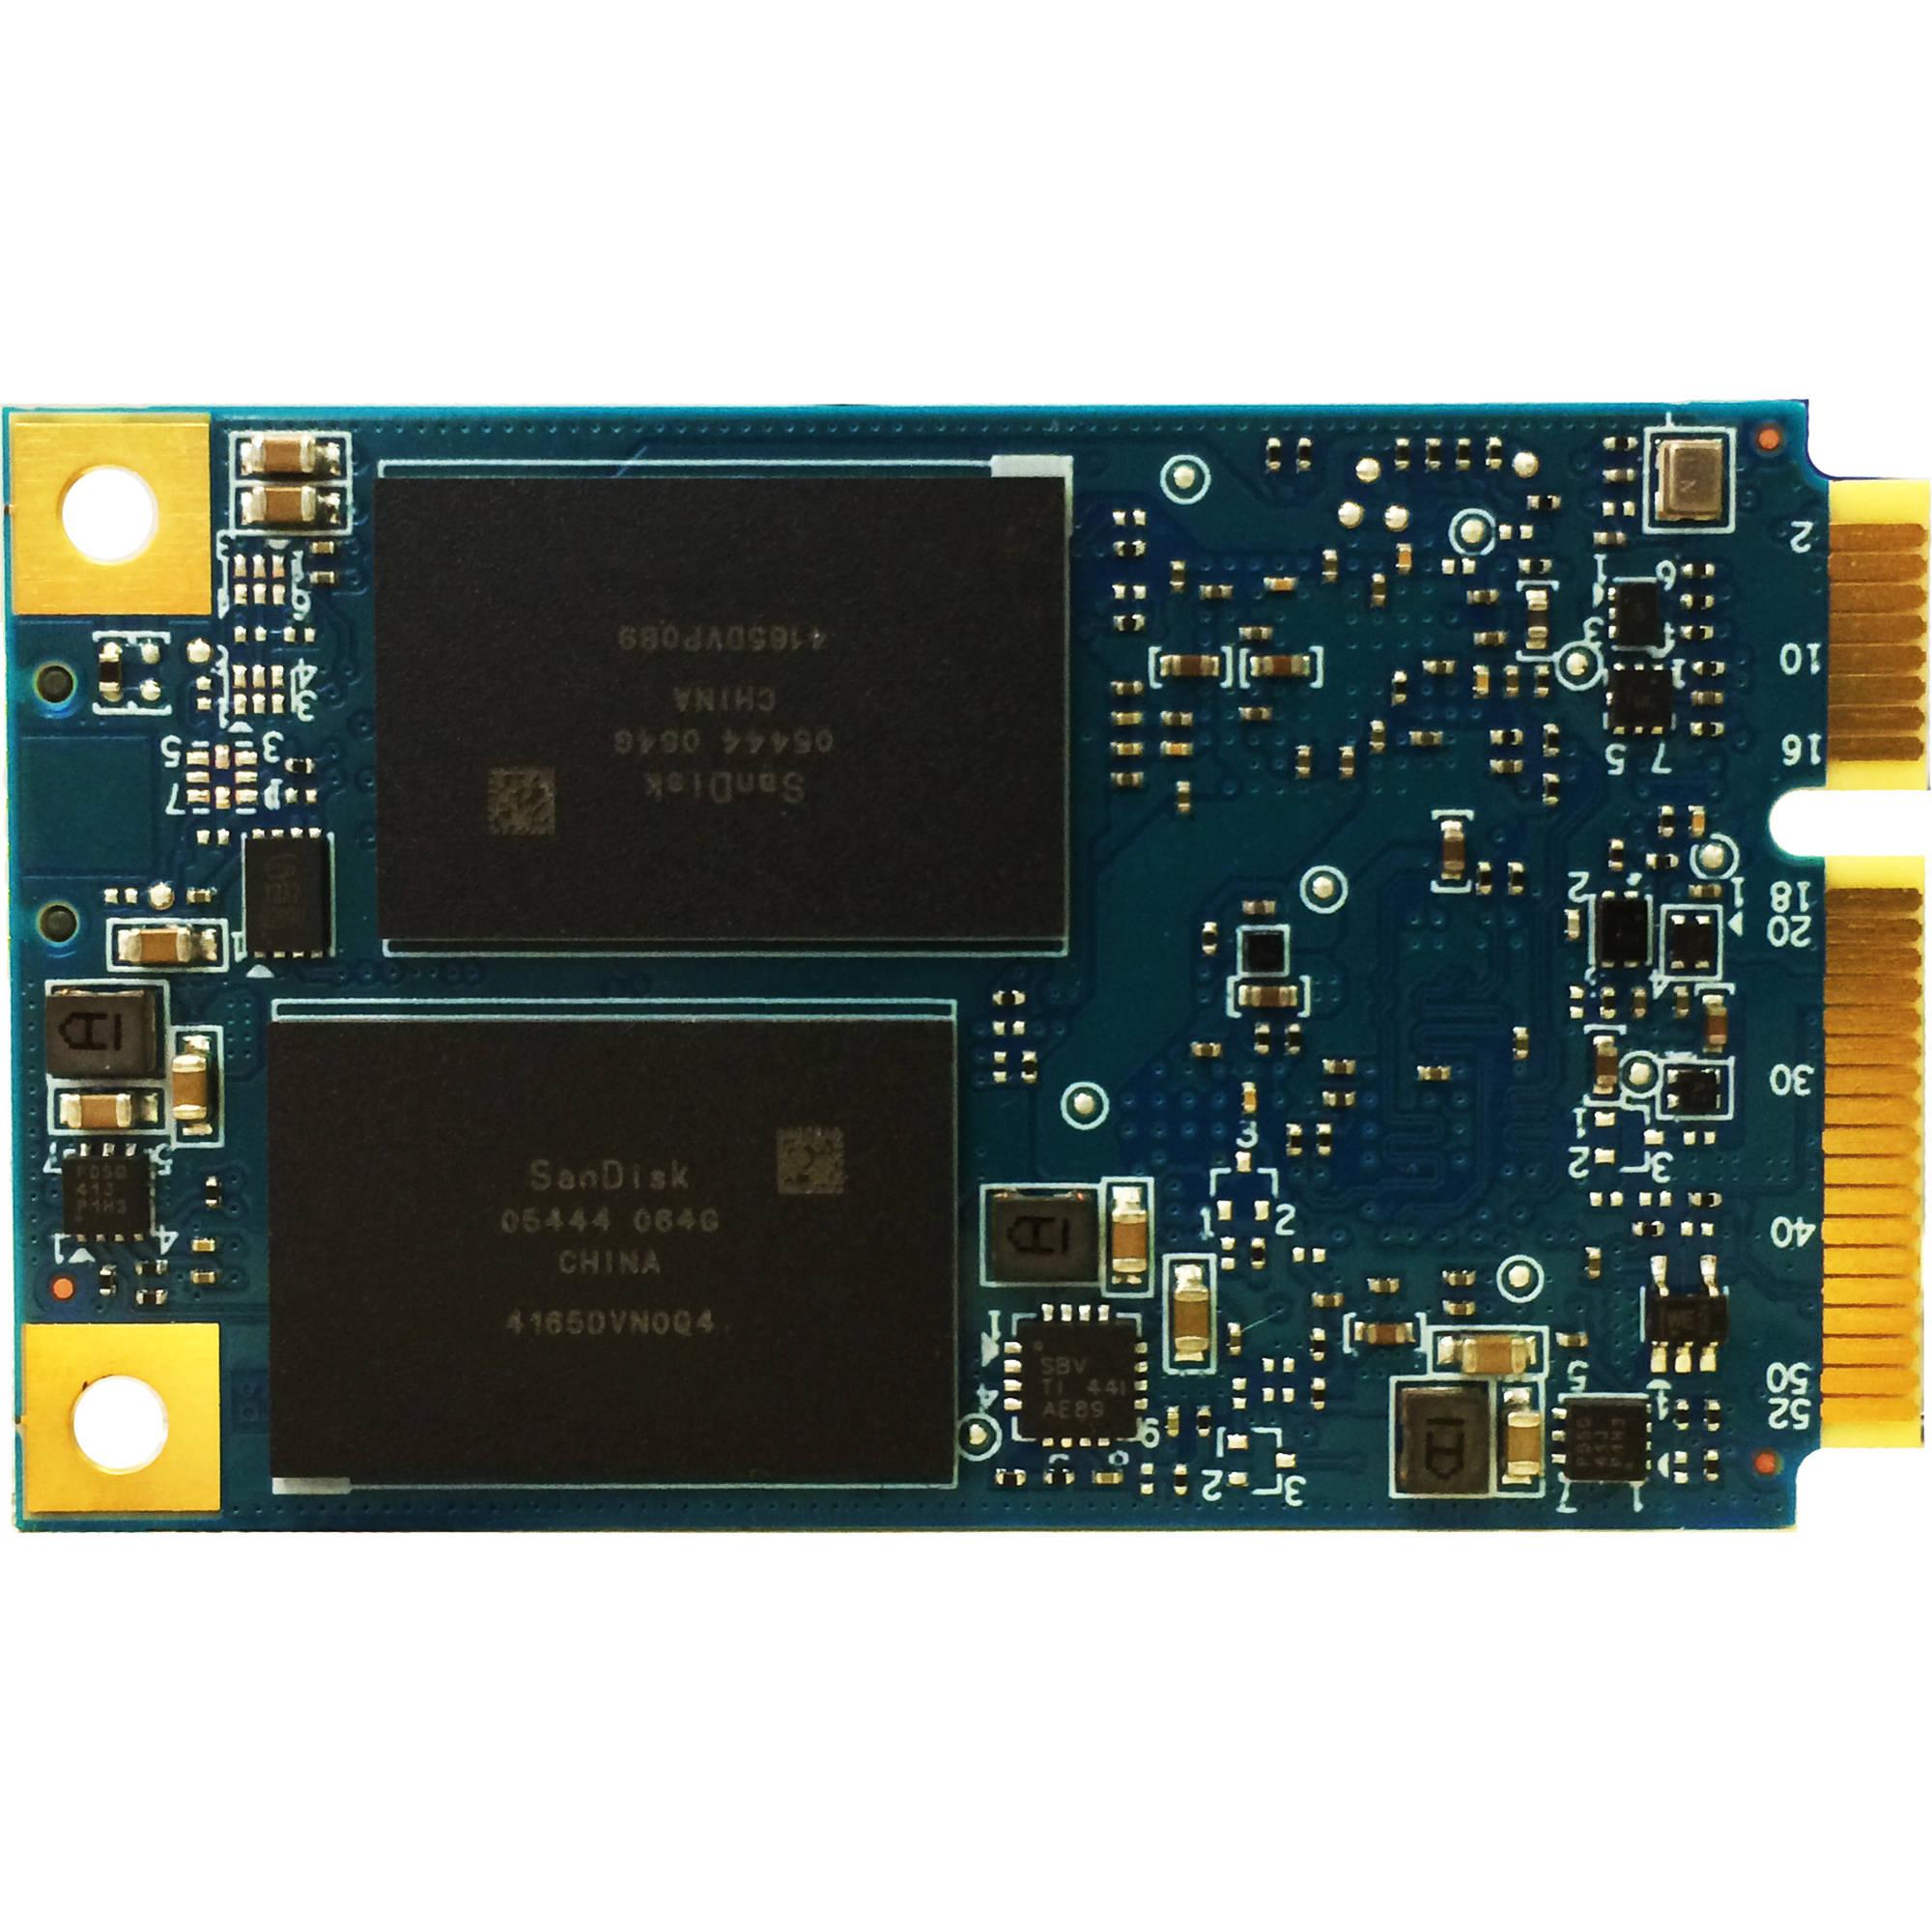 SanDisk 128GB X300 SATA III mSATA Internal SSD SD7SF6S ...